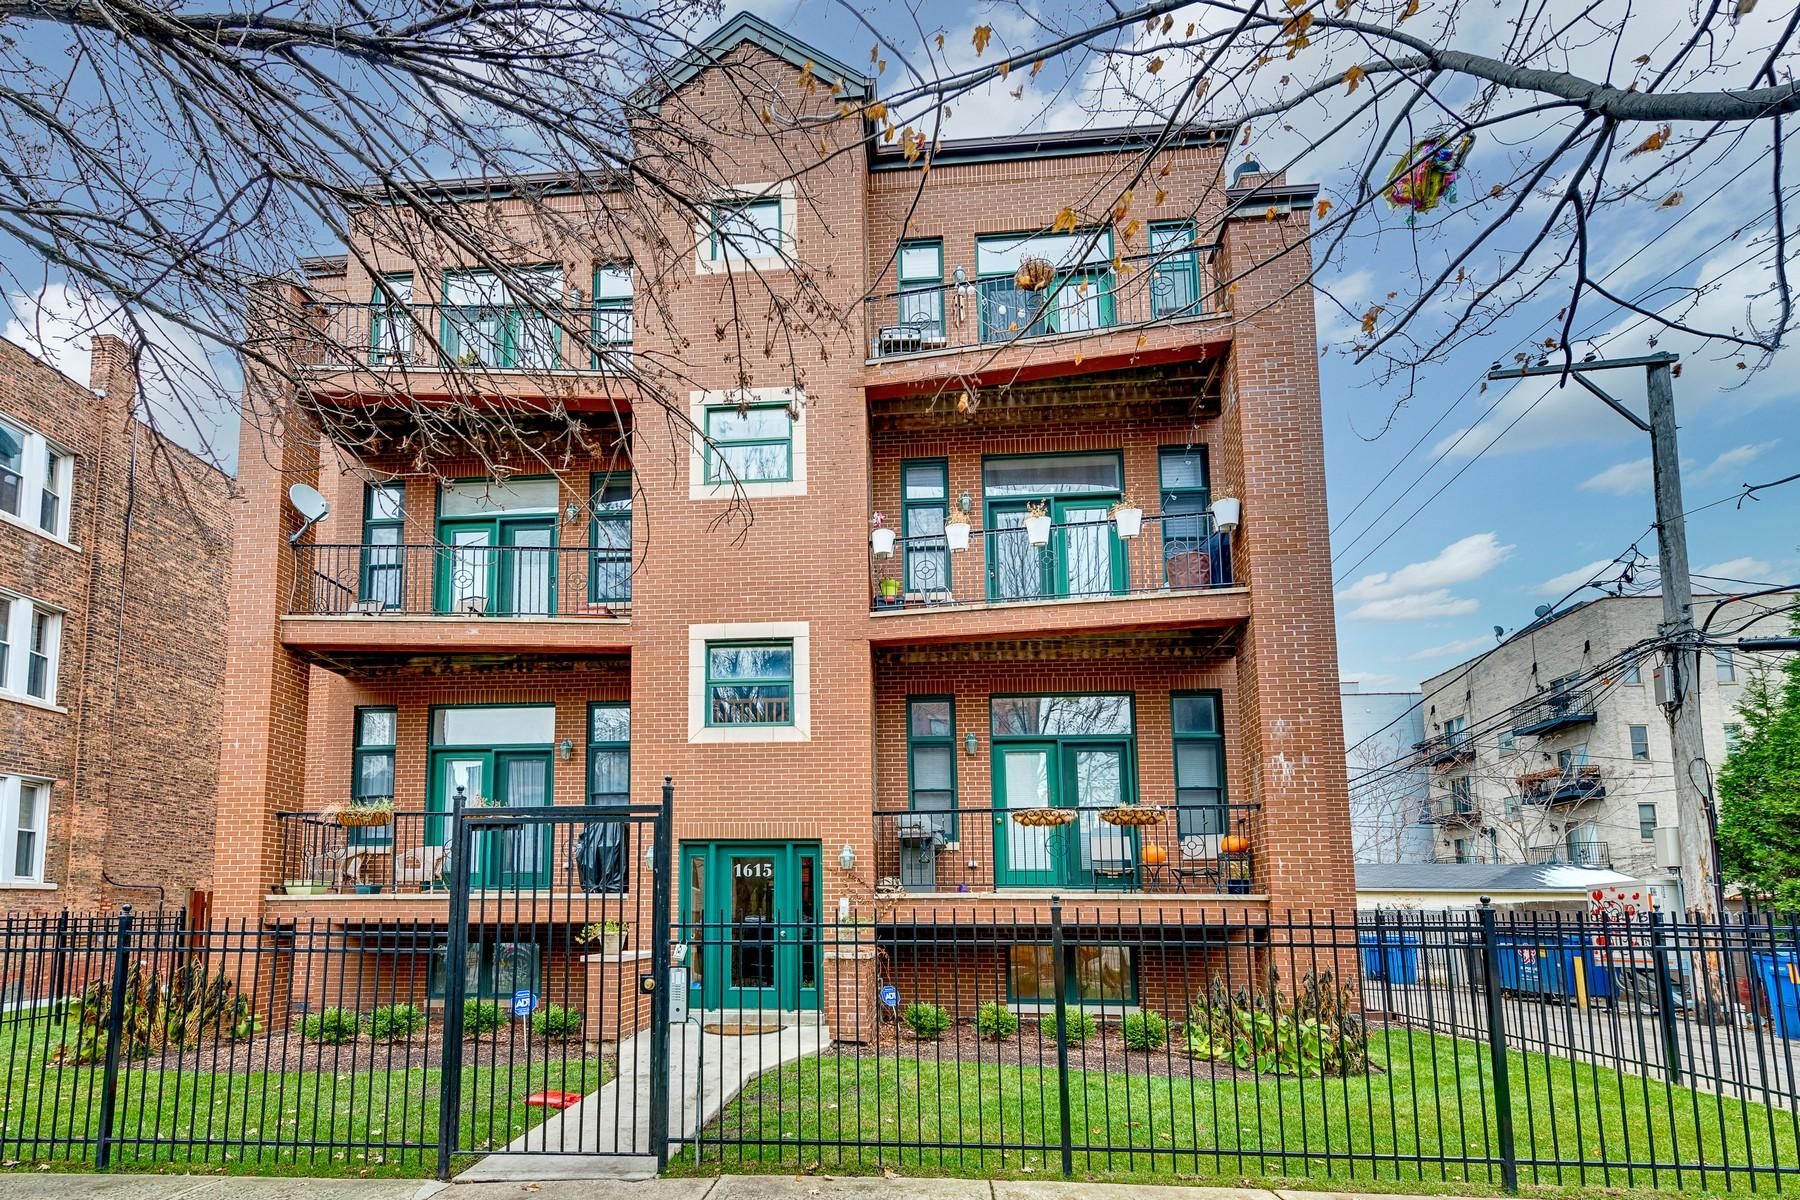 Condominium for Sale at Bucktown Stunner! 1615 N Claremont Avenue Unit 3N Logan Square, Chicago, Illinois 60647 United States